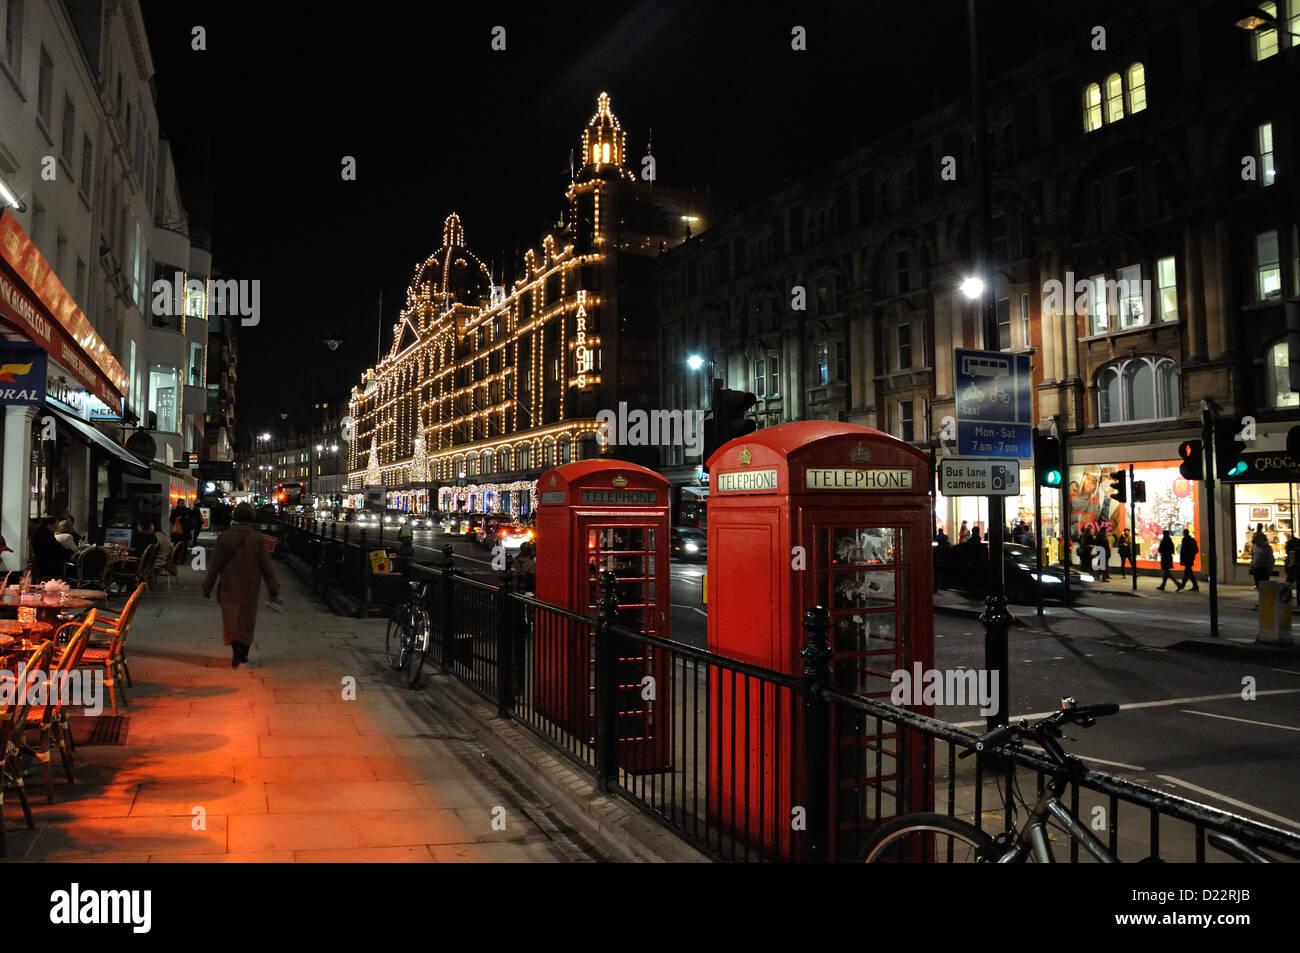 View of Knightsbridge, London looking towards Harrods - Stock Image